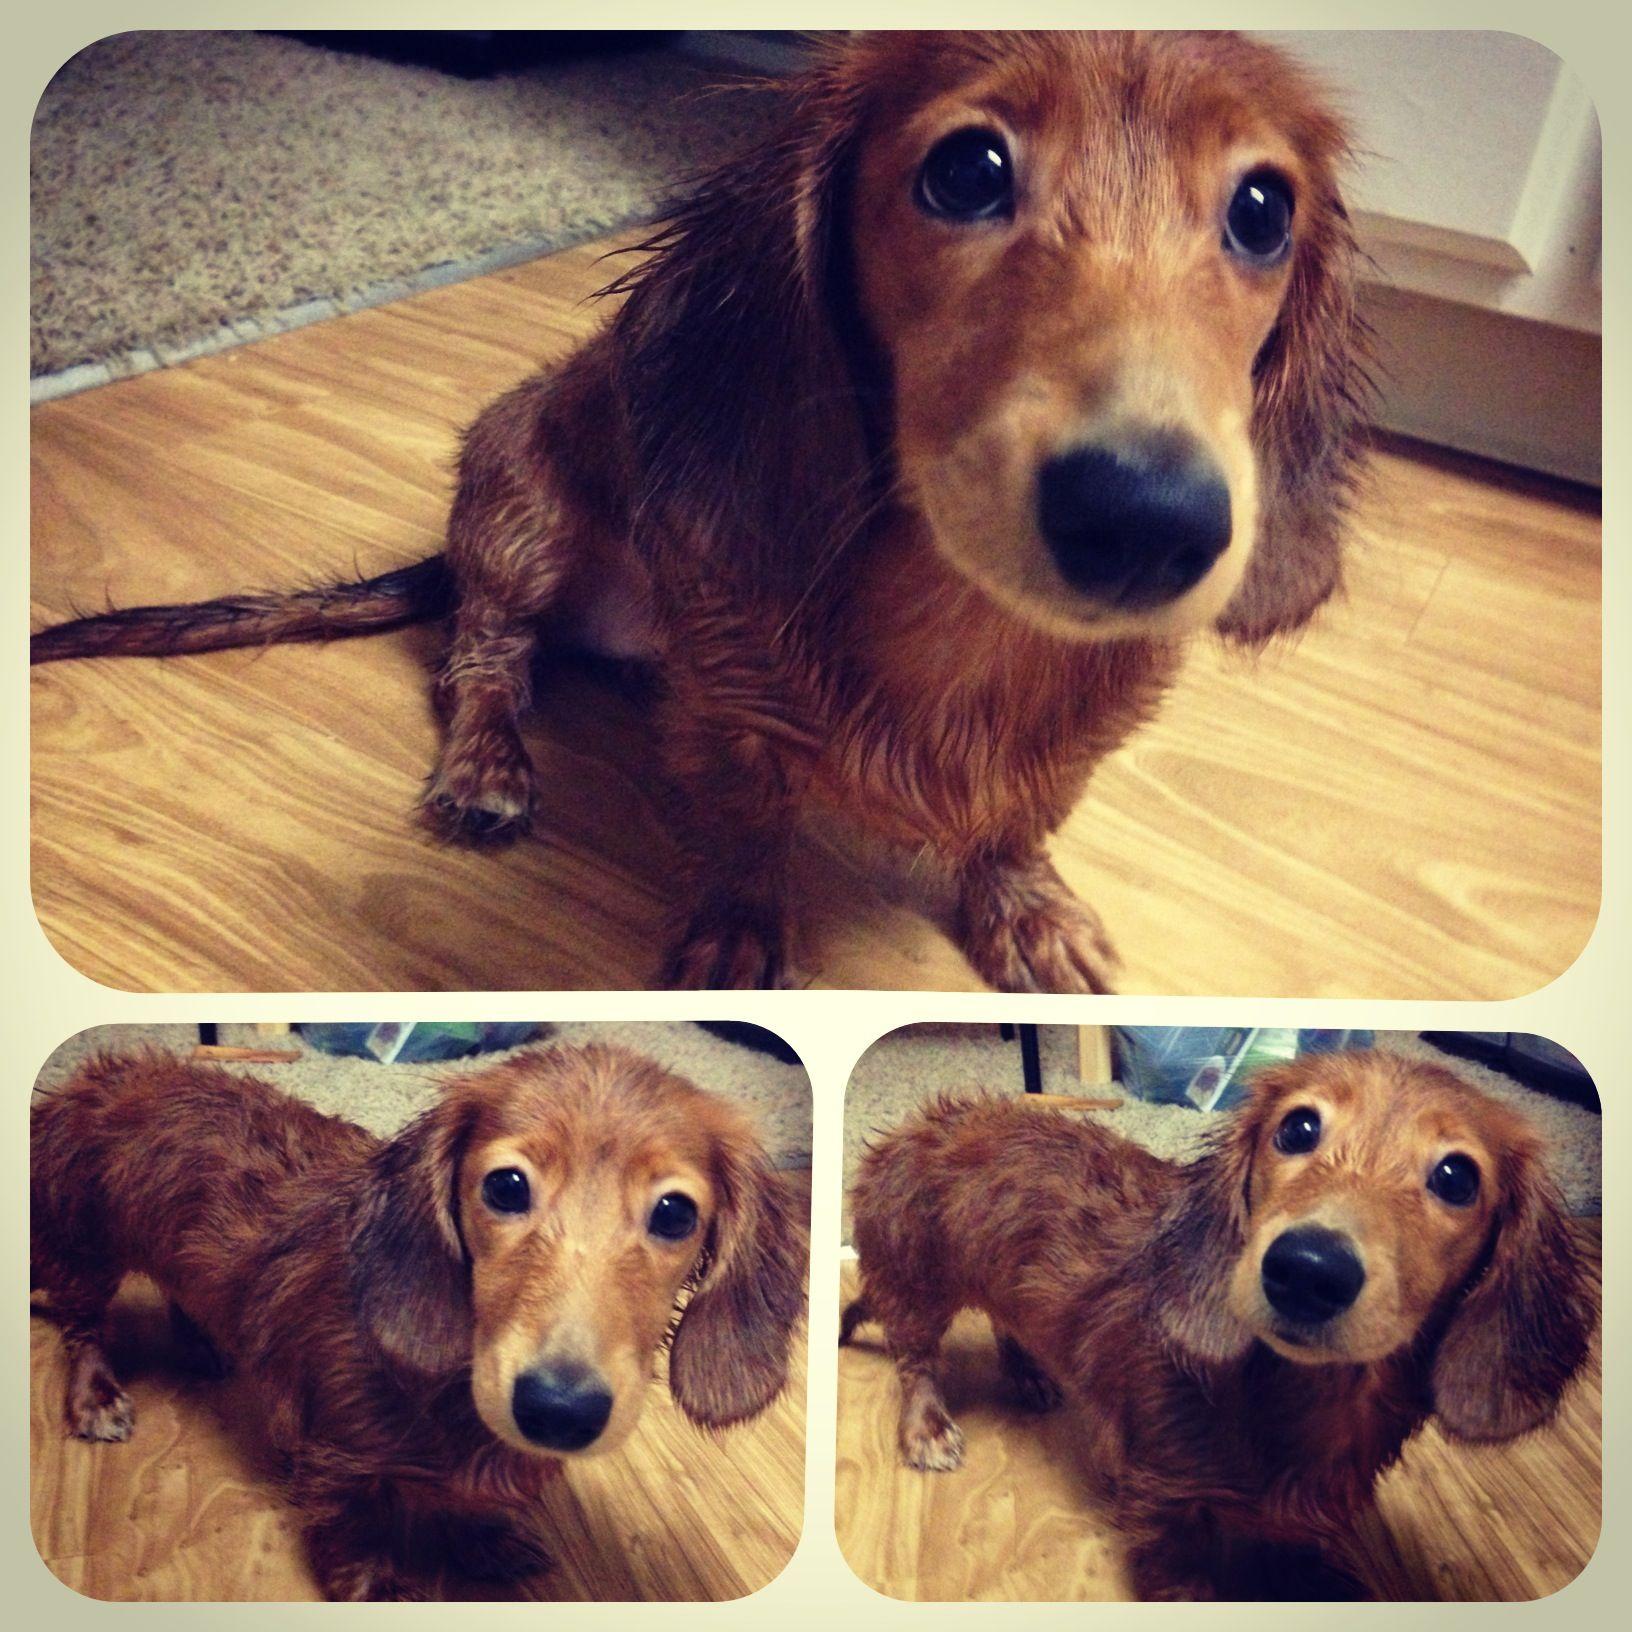 My cream dapple dachshund Penelope! The sweetest puppy in